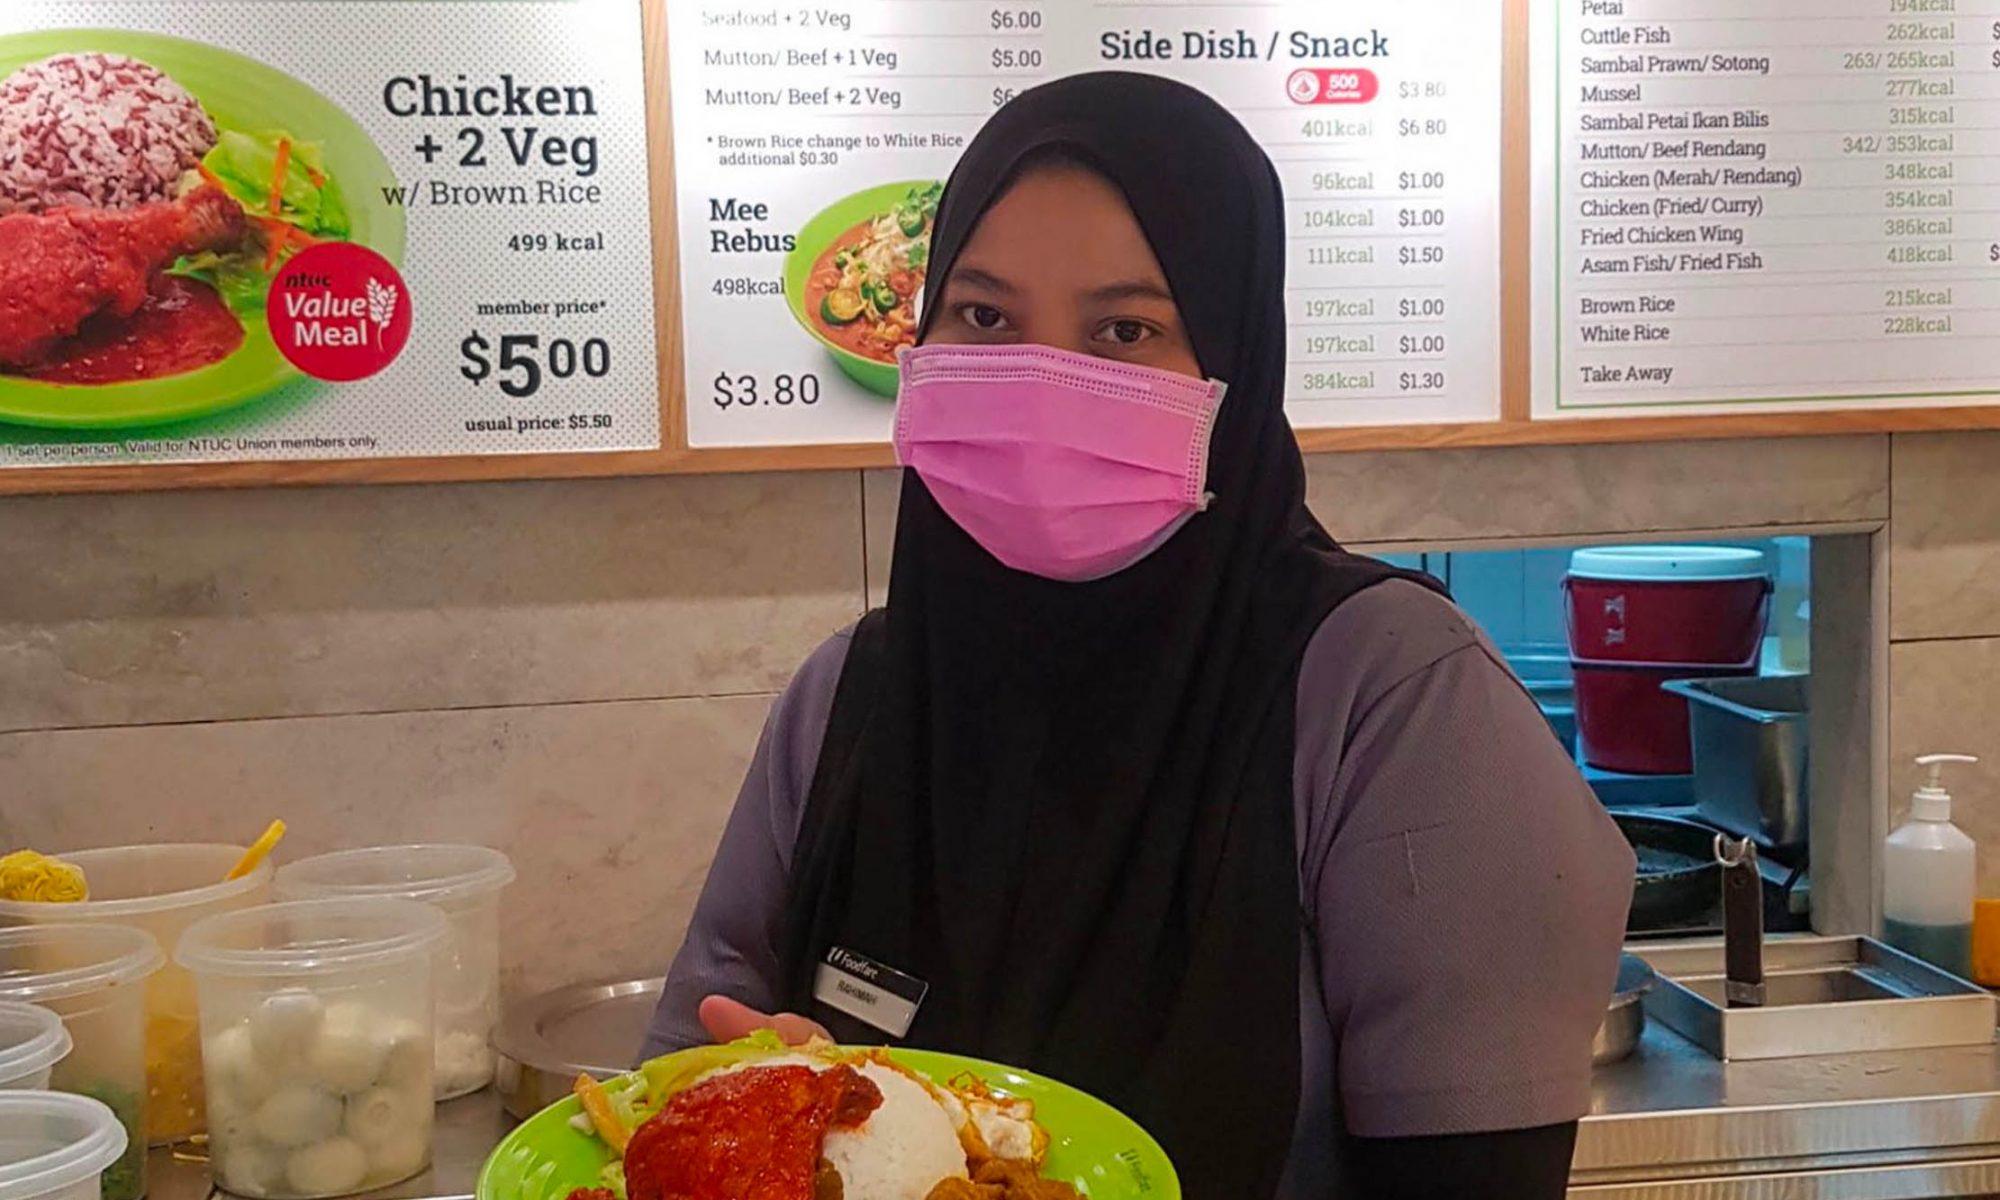 Malay Cuisine @ Khoo Teck Puat Hospital